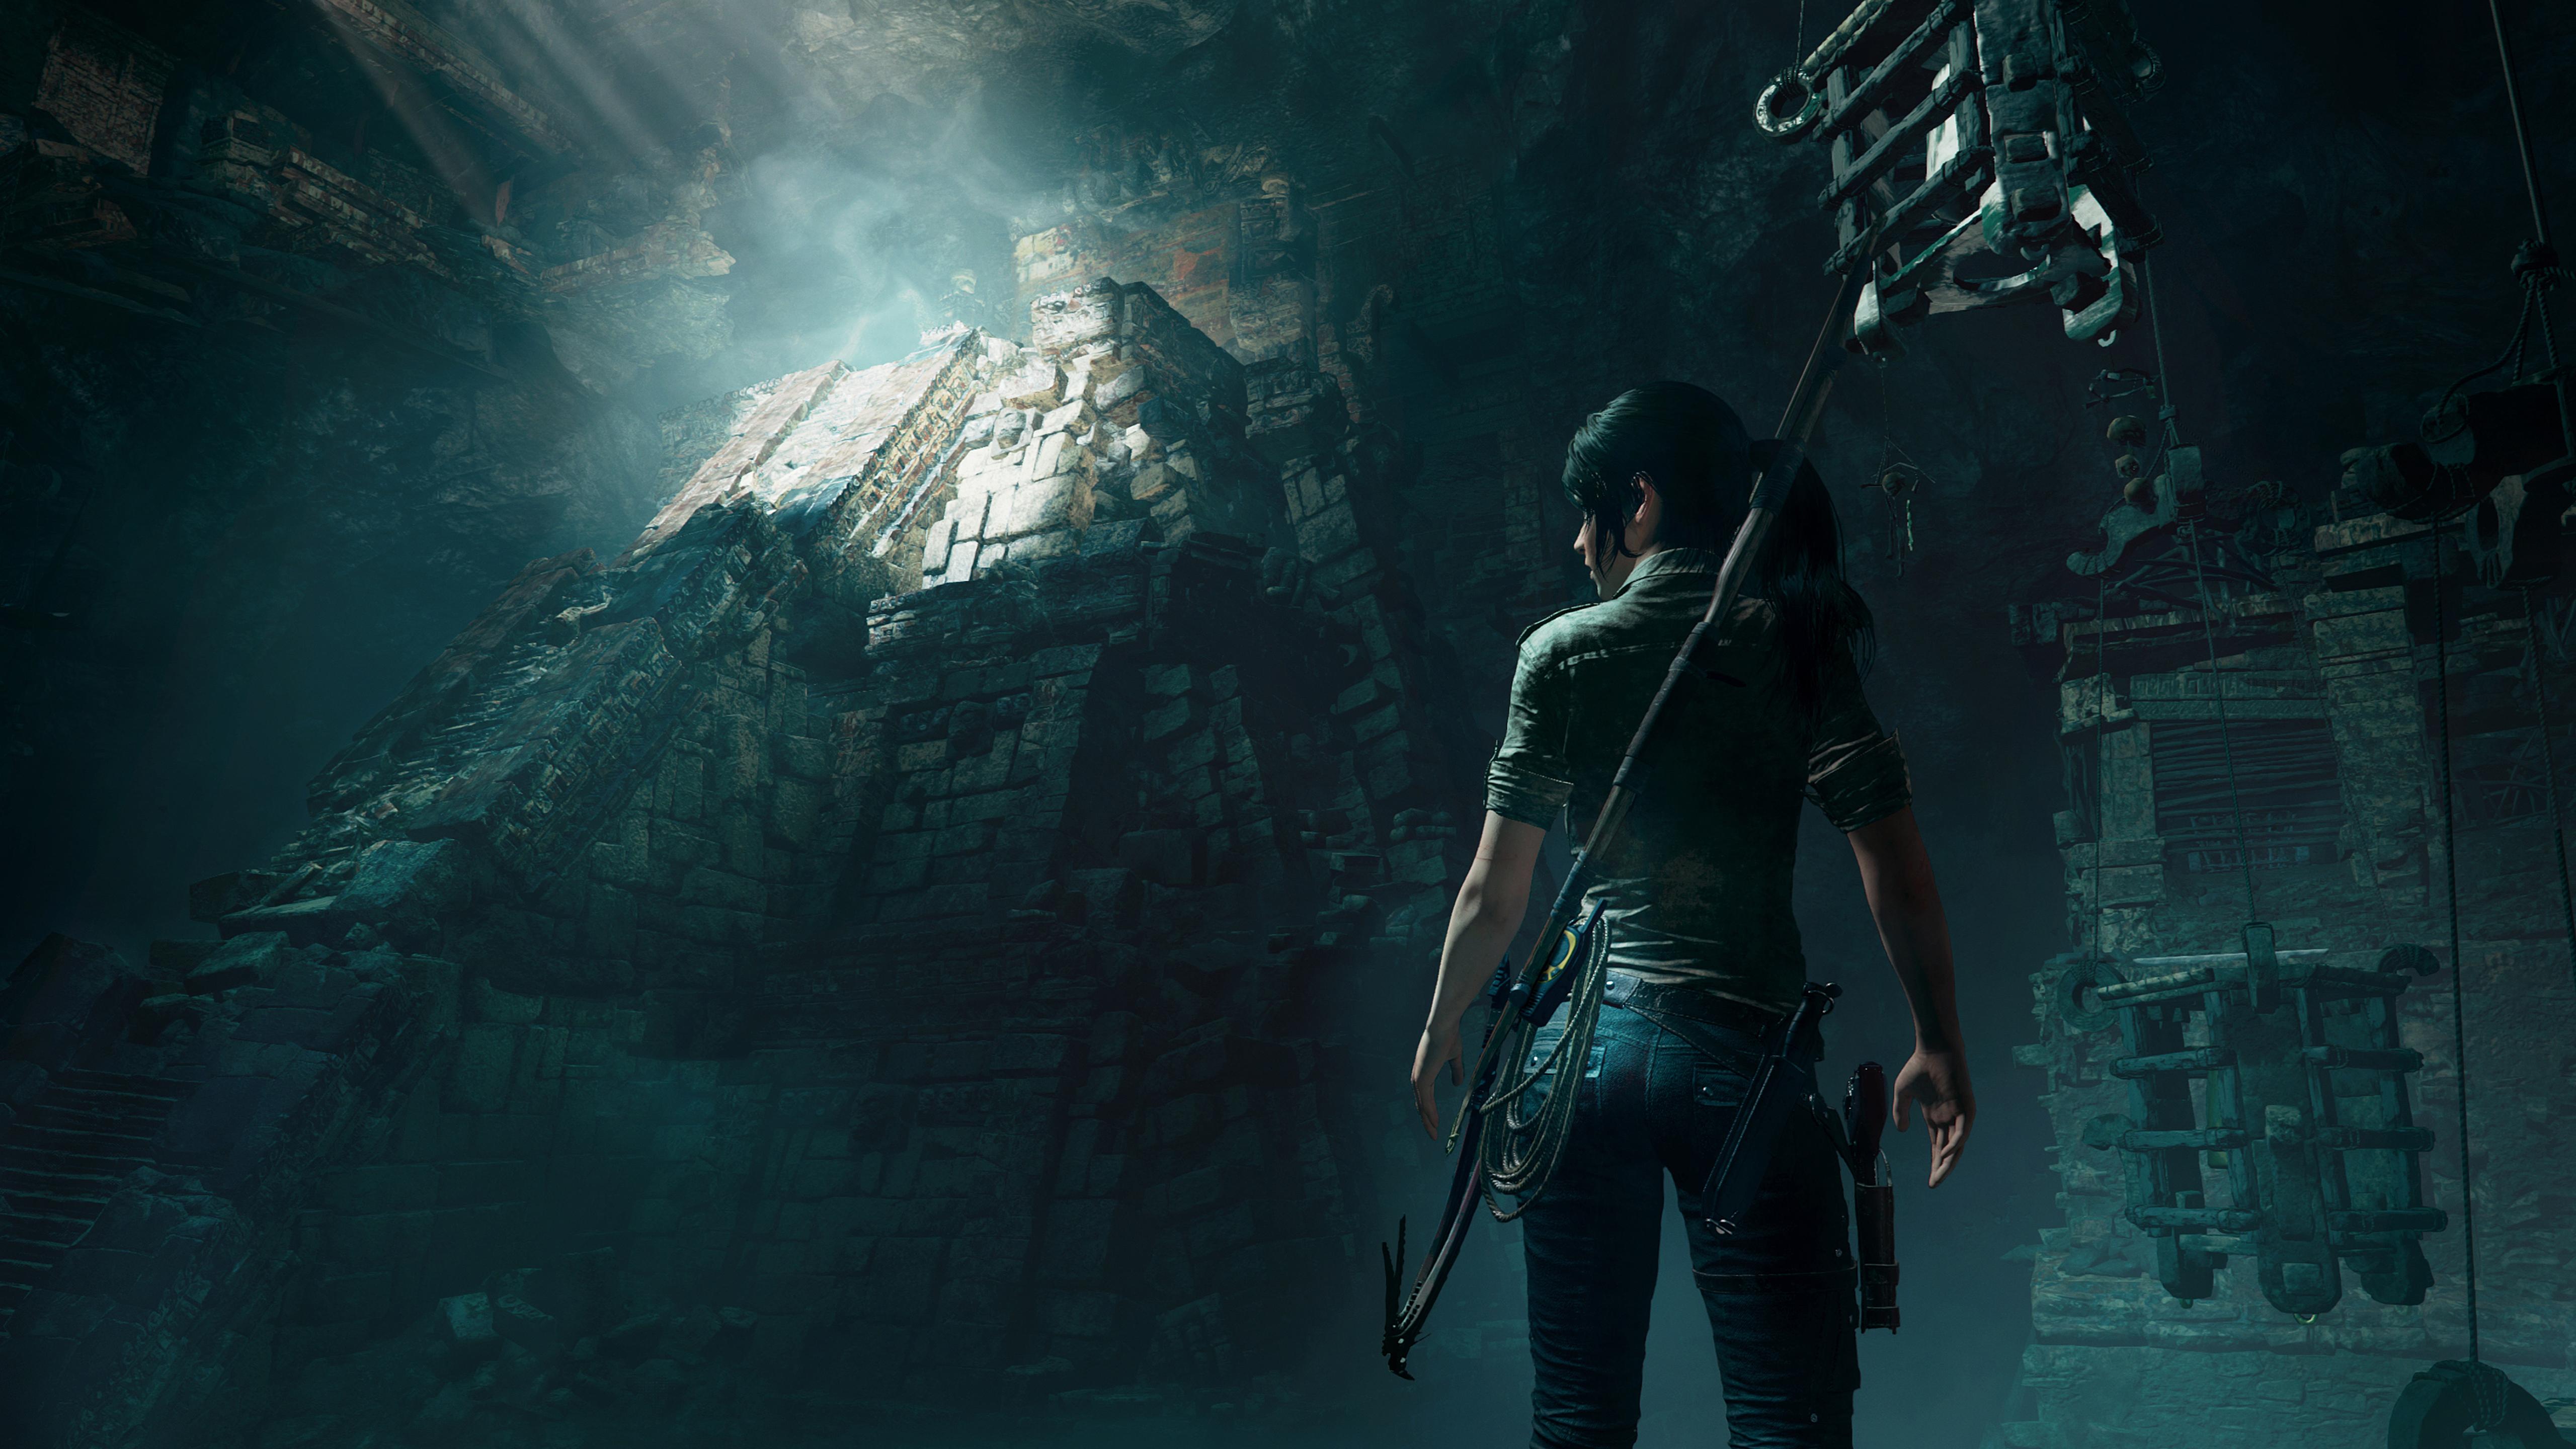 Shadow Of The Tomb Raider 5k Retina Ultra Hd Wallpaper